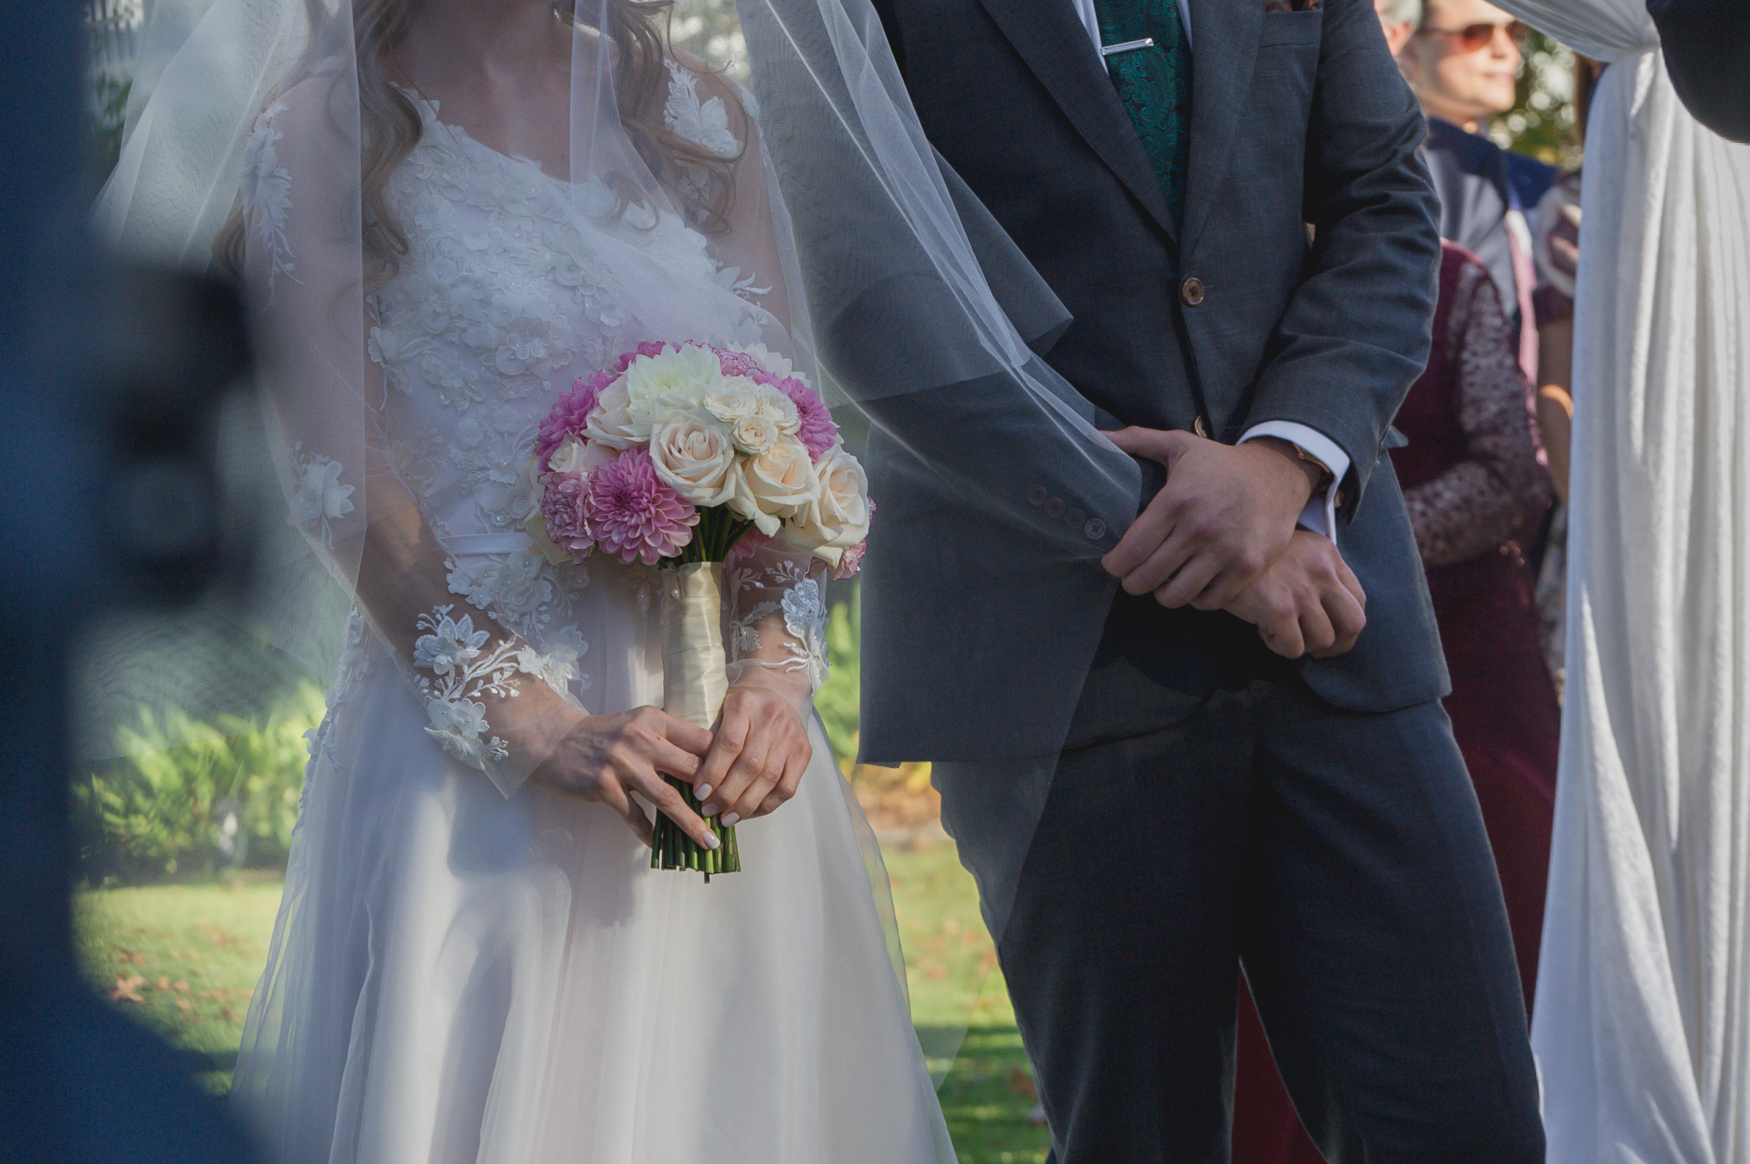 Leon_&_Martine's_Wedding_Photographs_17th_April_2019_@johnhenryweddingphoto_Low_Resolution_Web-255.JPG